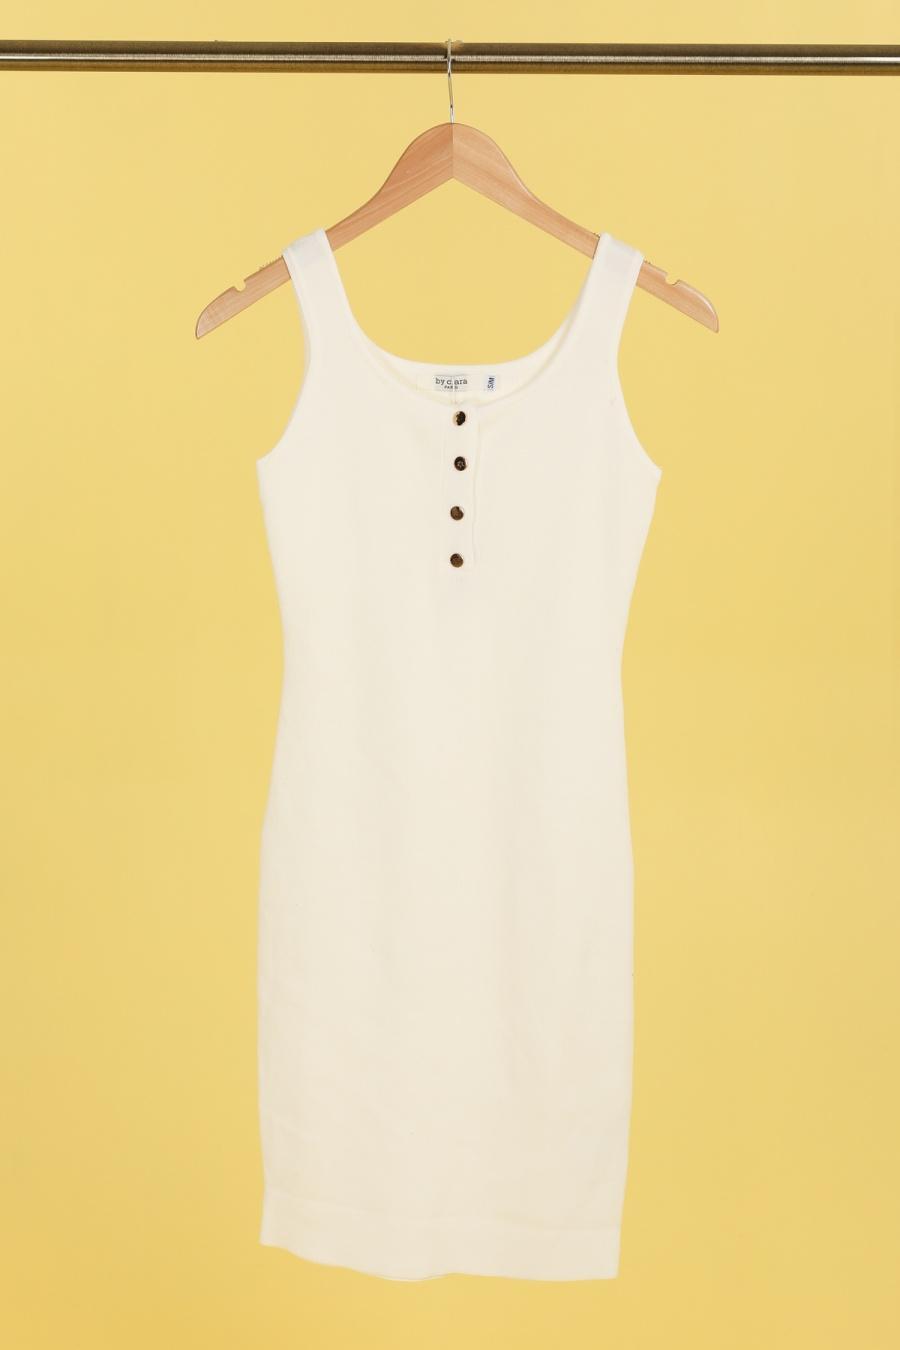 Robes courtes Femme Blanc By Clara 3023 #c eFashion Paris